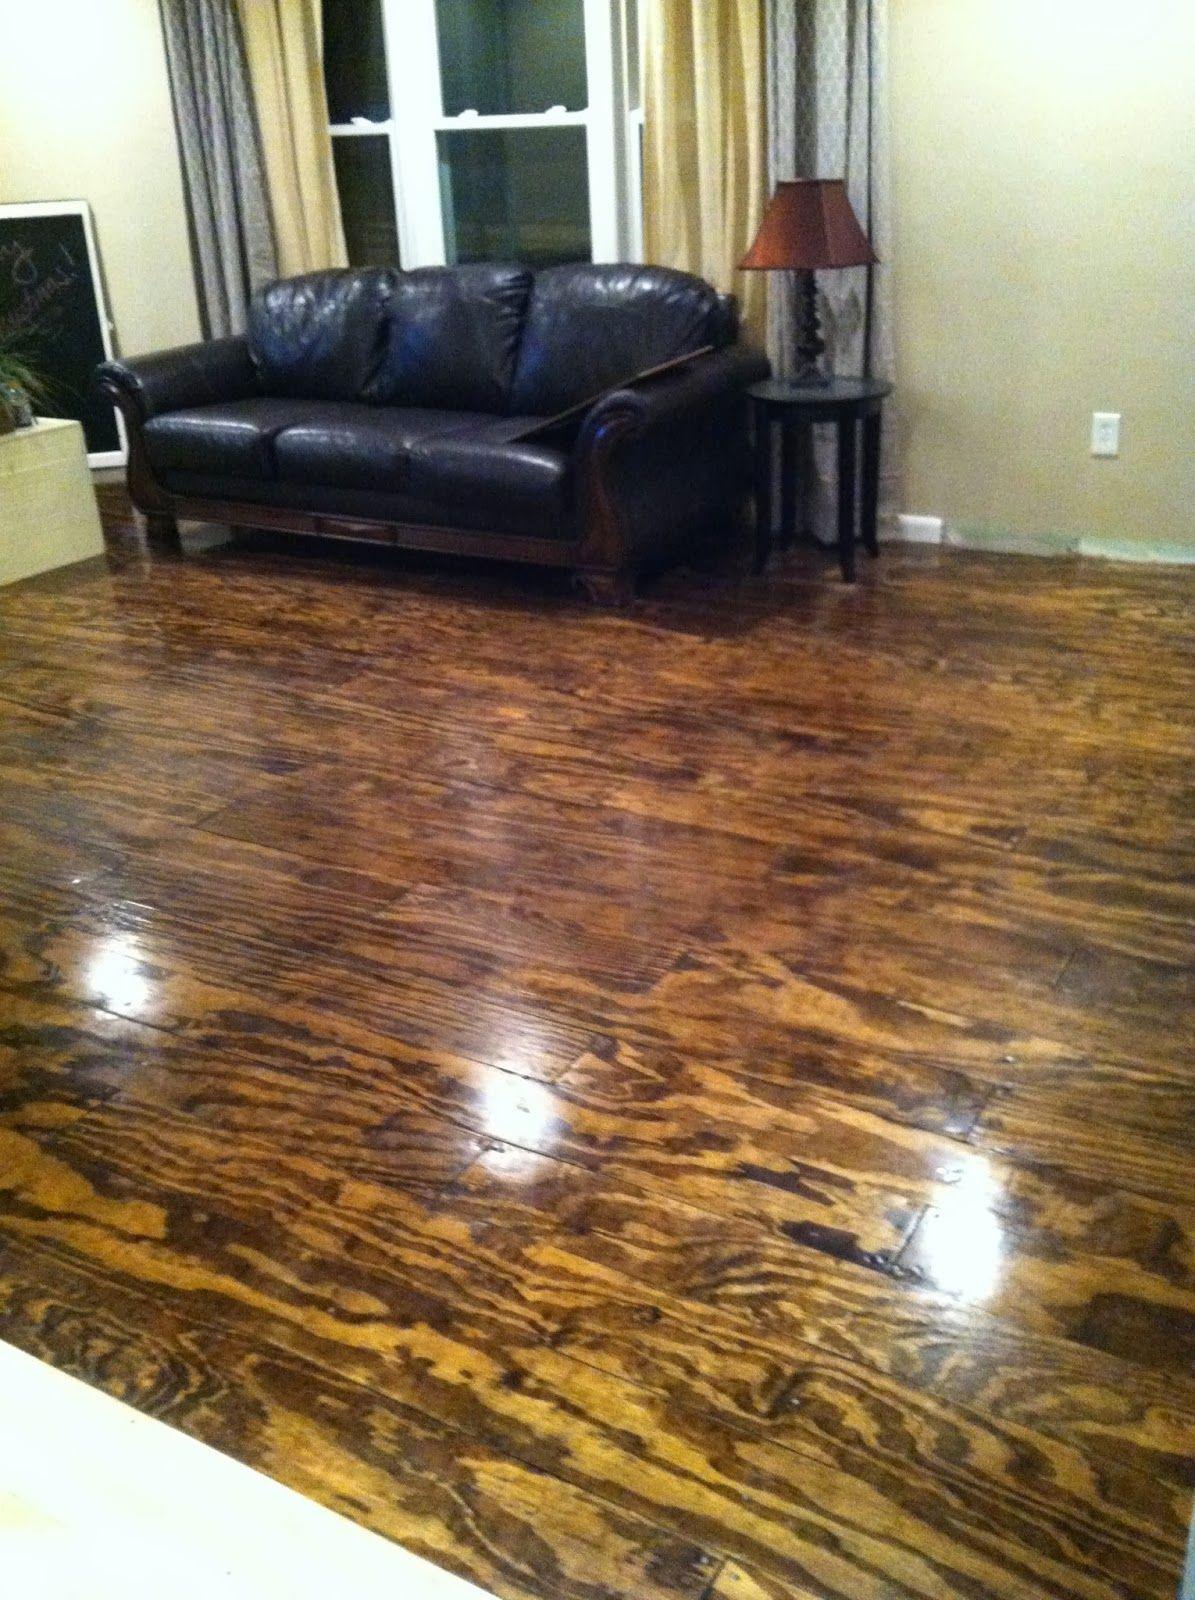 Plywood Floor Diy Plywood Flooring Diy Burnt Plywood Floor Wood Floor Design